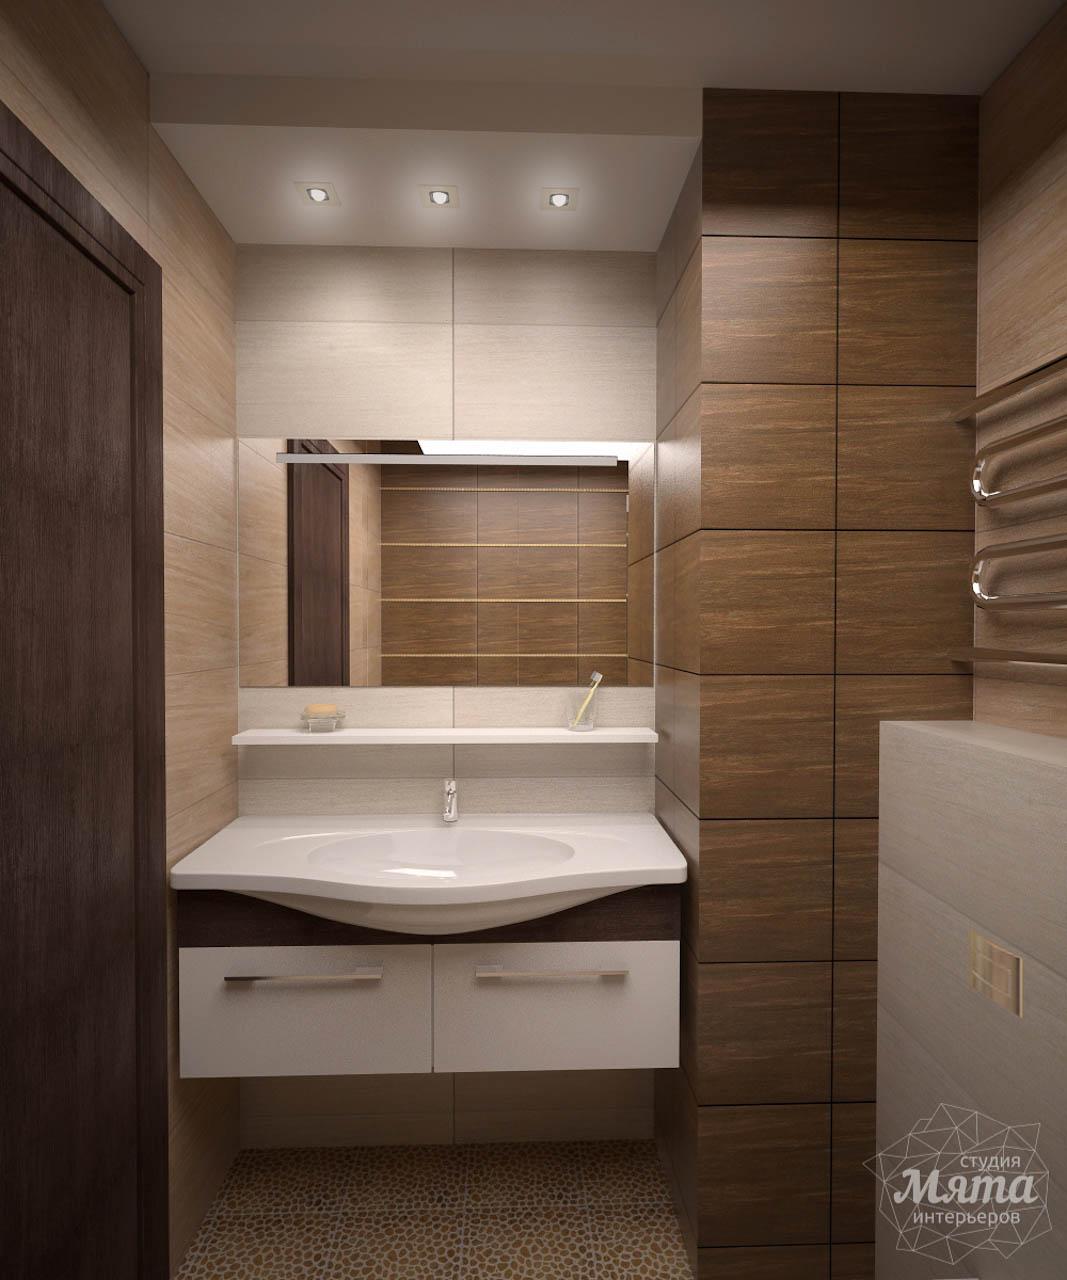 Дизайн интерьера двухкомнатной квартиры по ул. Комсомольская 14 img1733260901